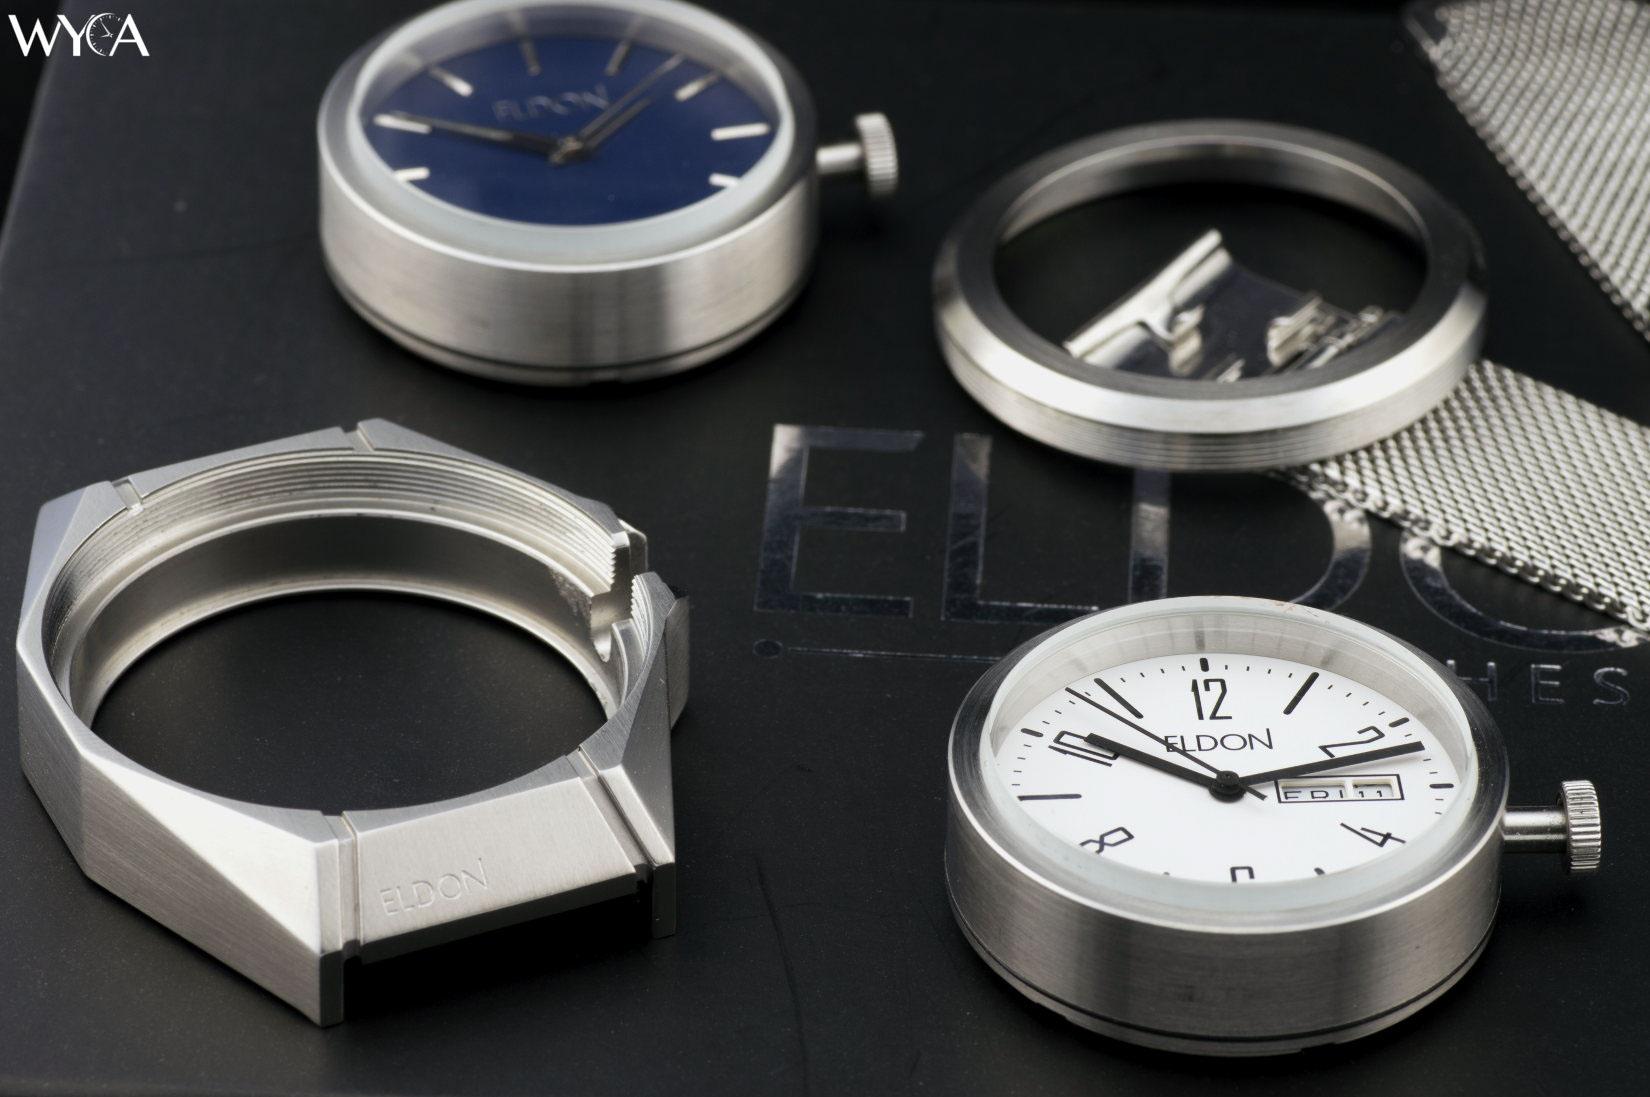 Watch prototype components